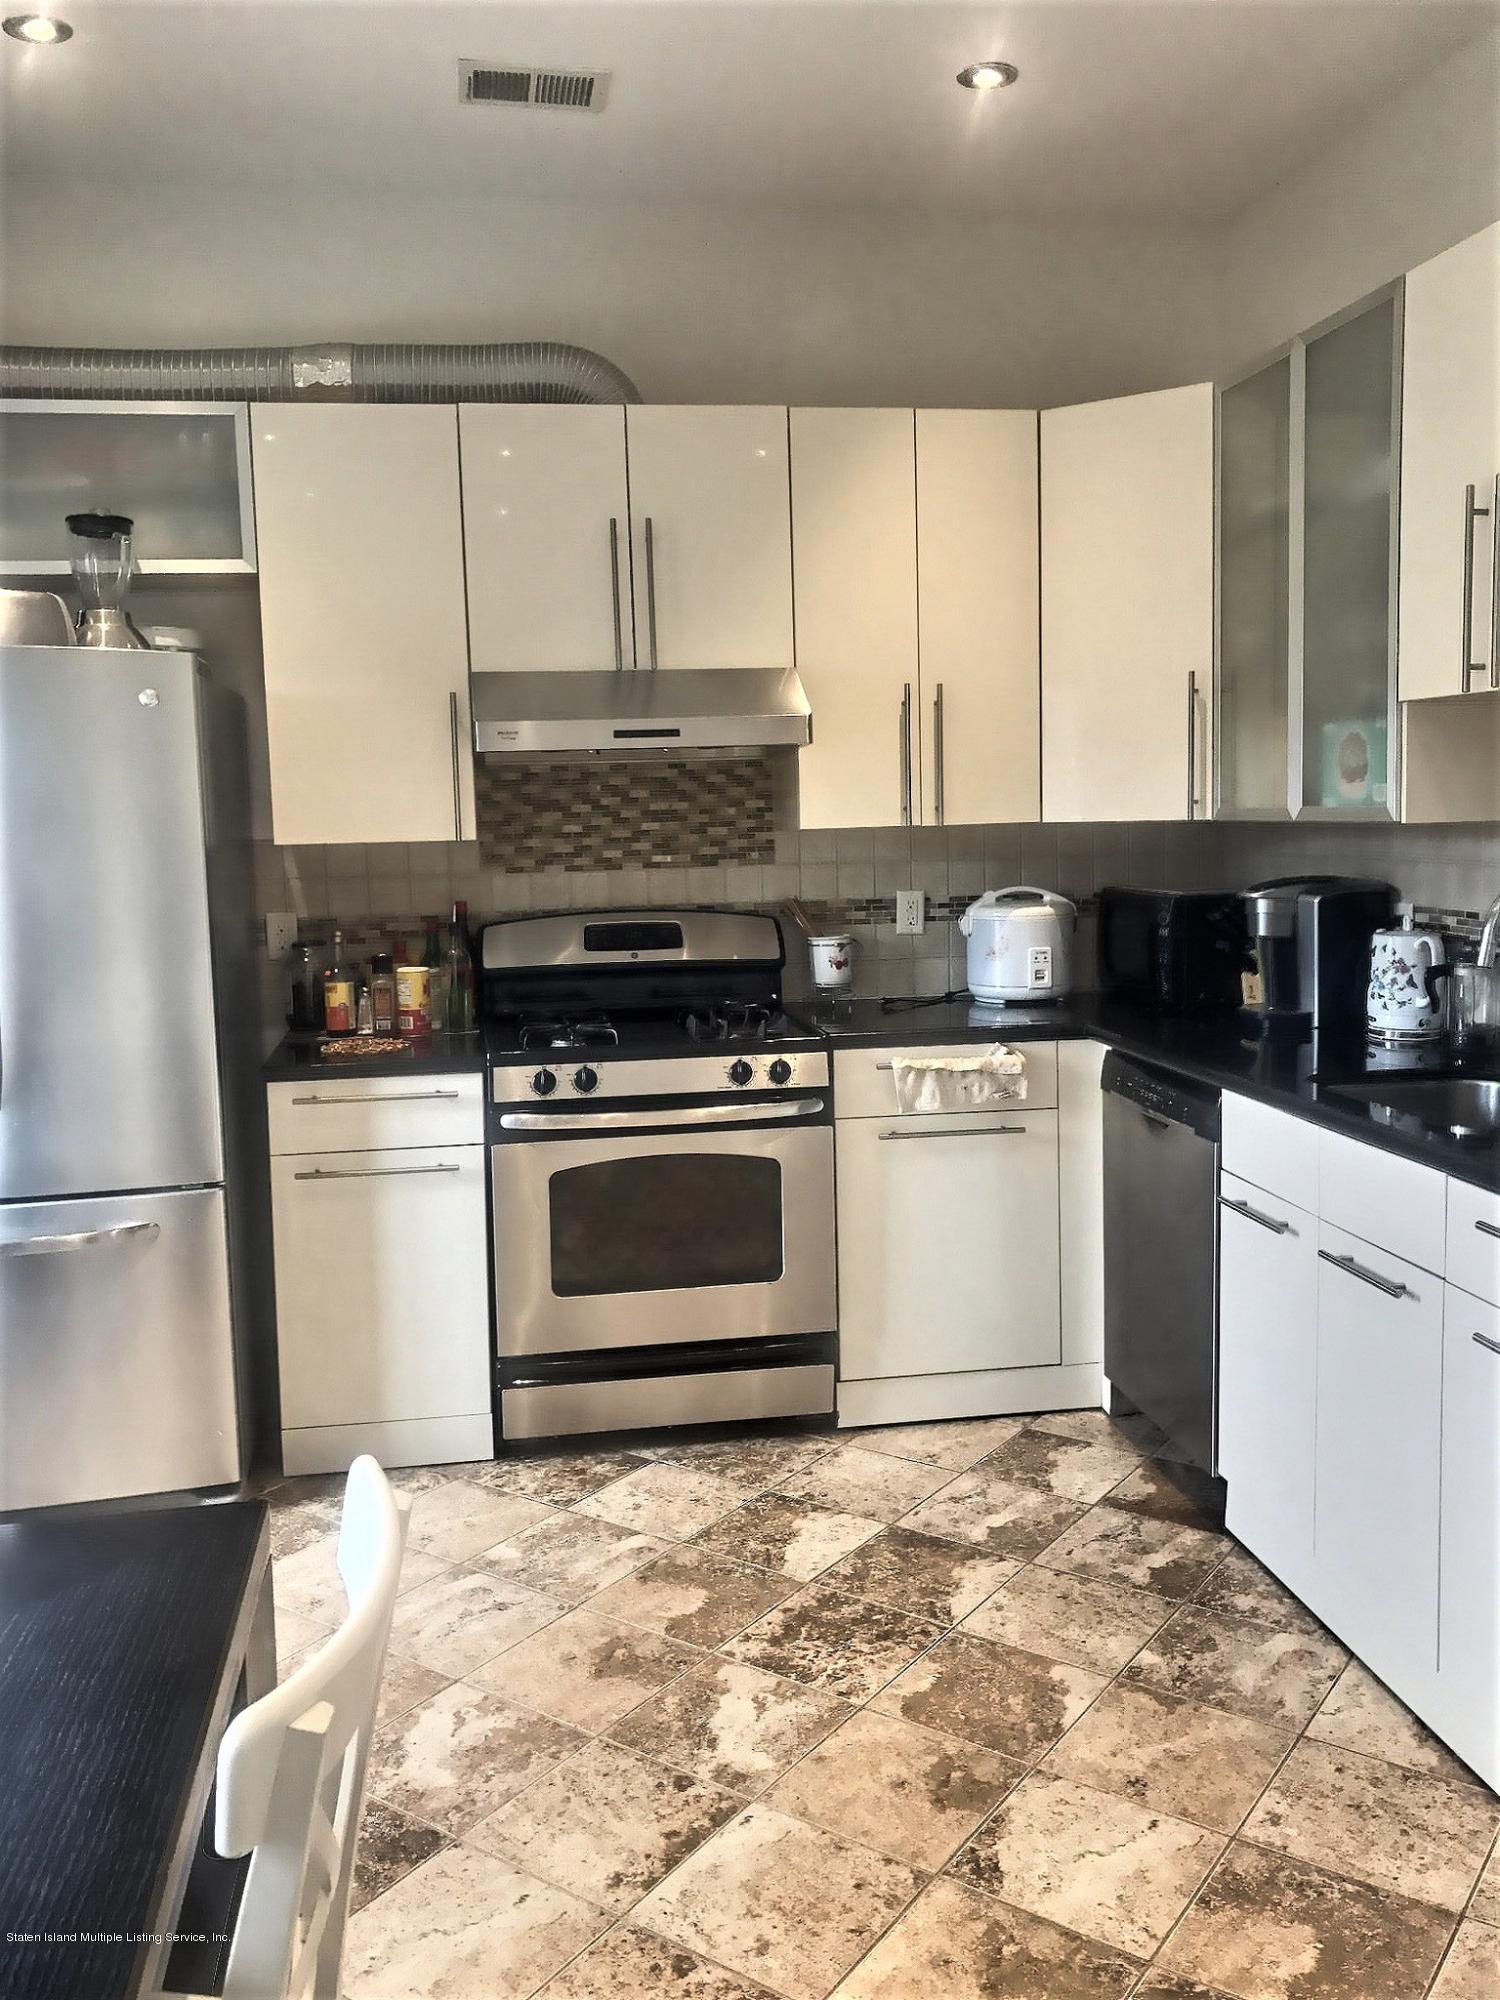 Single Family - Attached 58 Garretson Lane  Staten Island, NY 10304, MLS-1128138-4